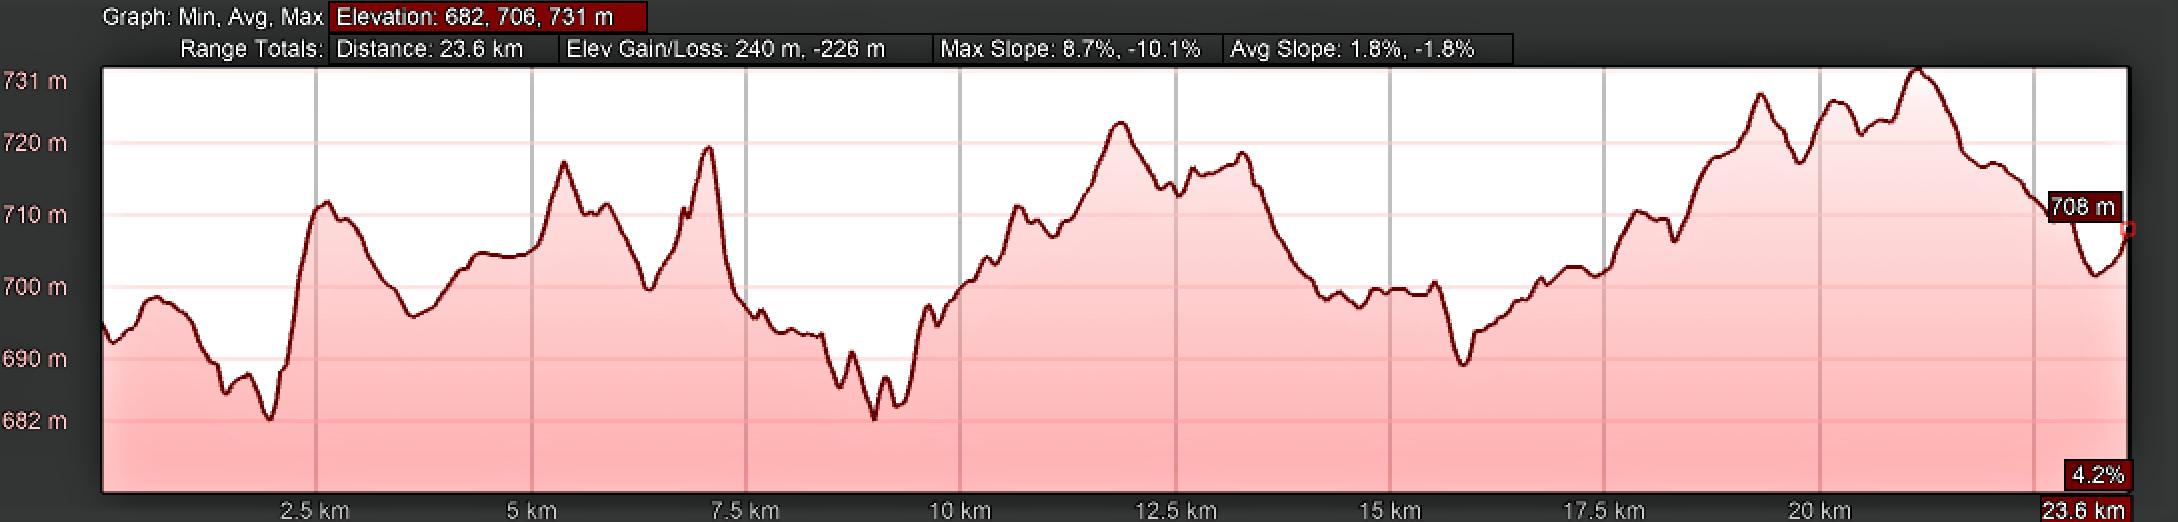 Elevation Profile, Vía de la Plata, Montamarta to Granja de Moreruela